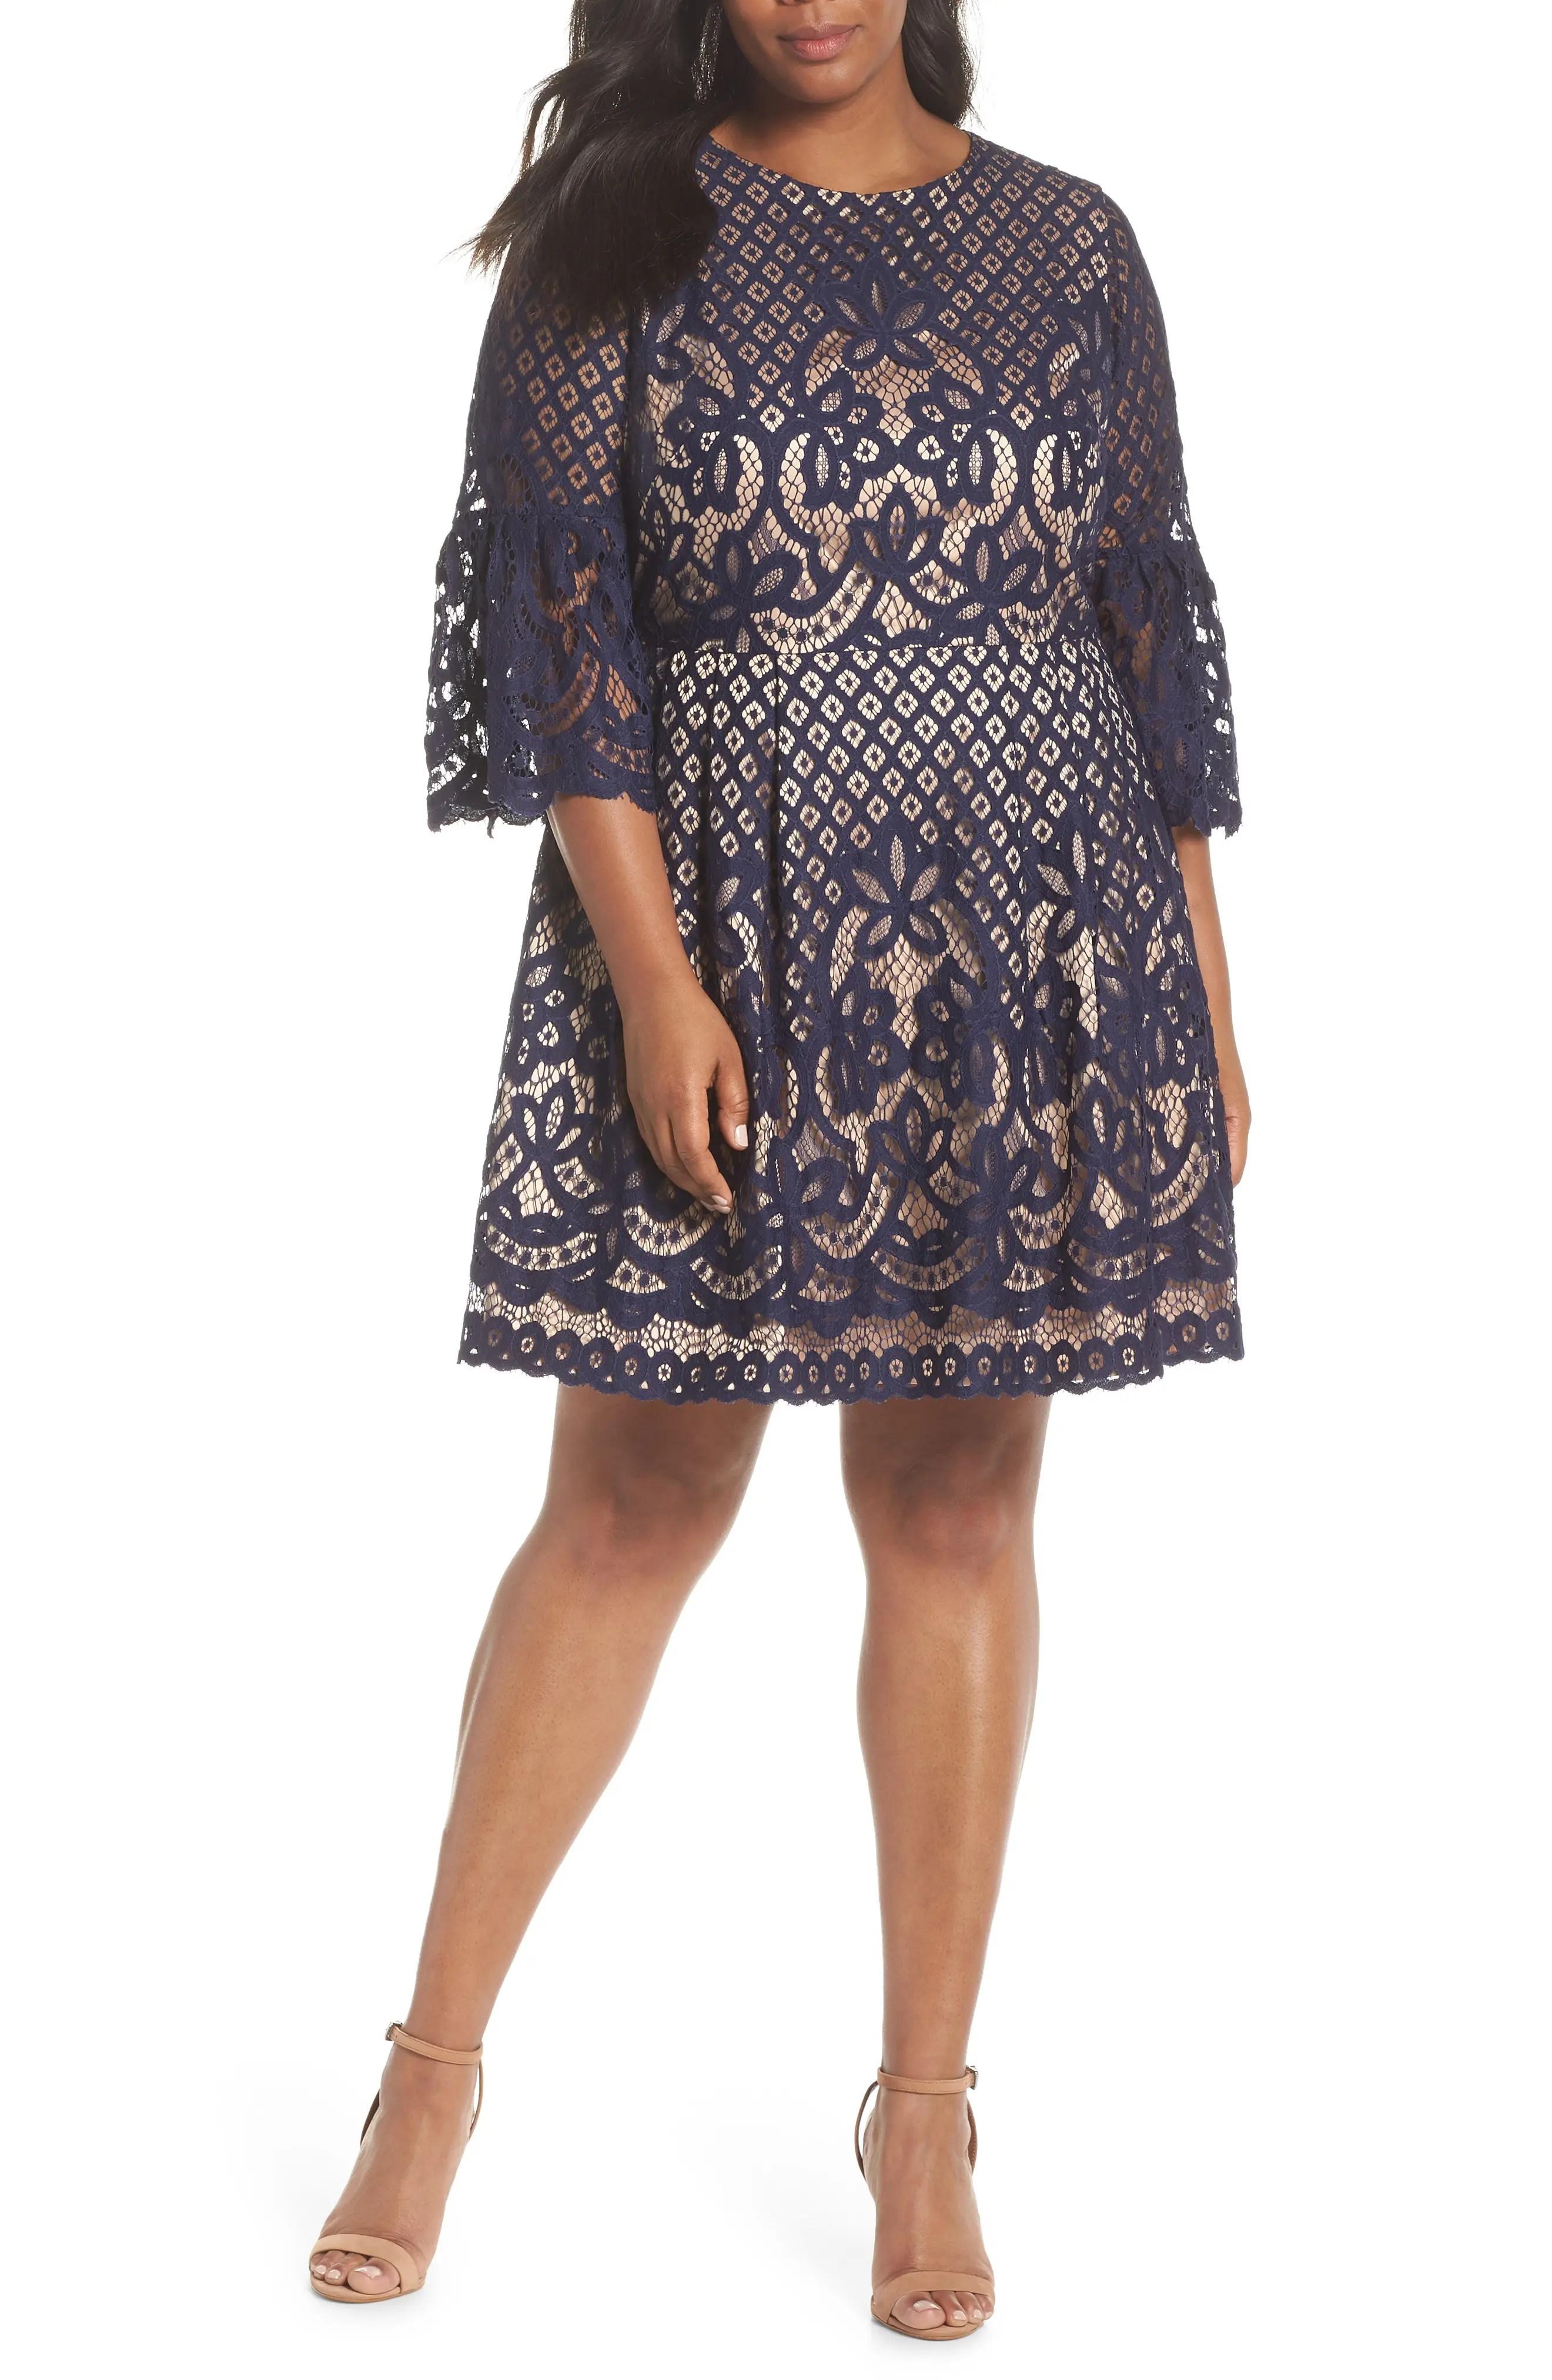 Eliza  bell sleeve lace fit  flare dress plus size also dresses nordstrom rh shoprdstrom